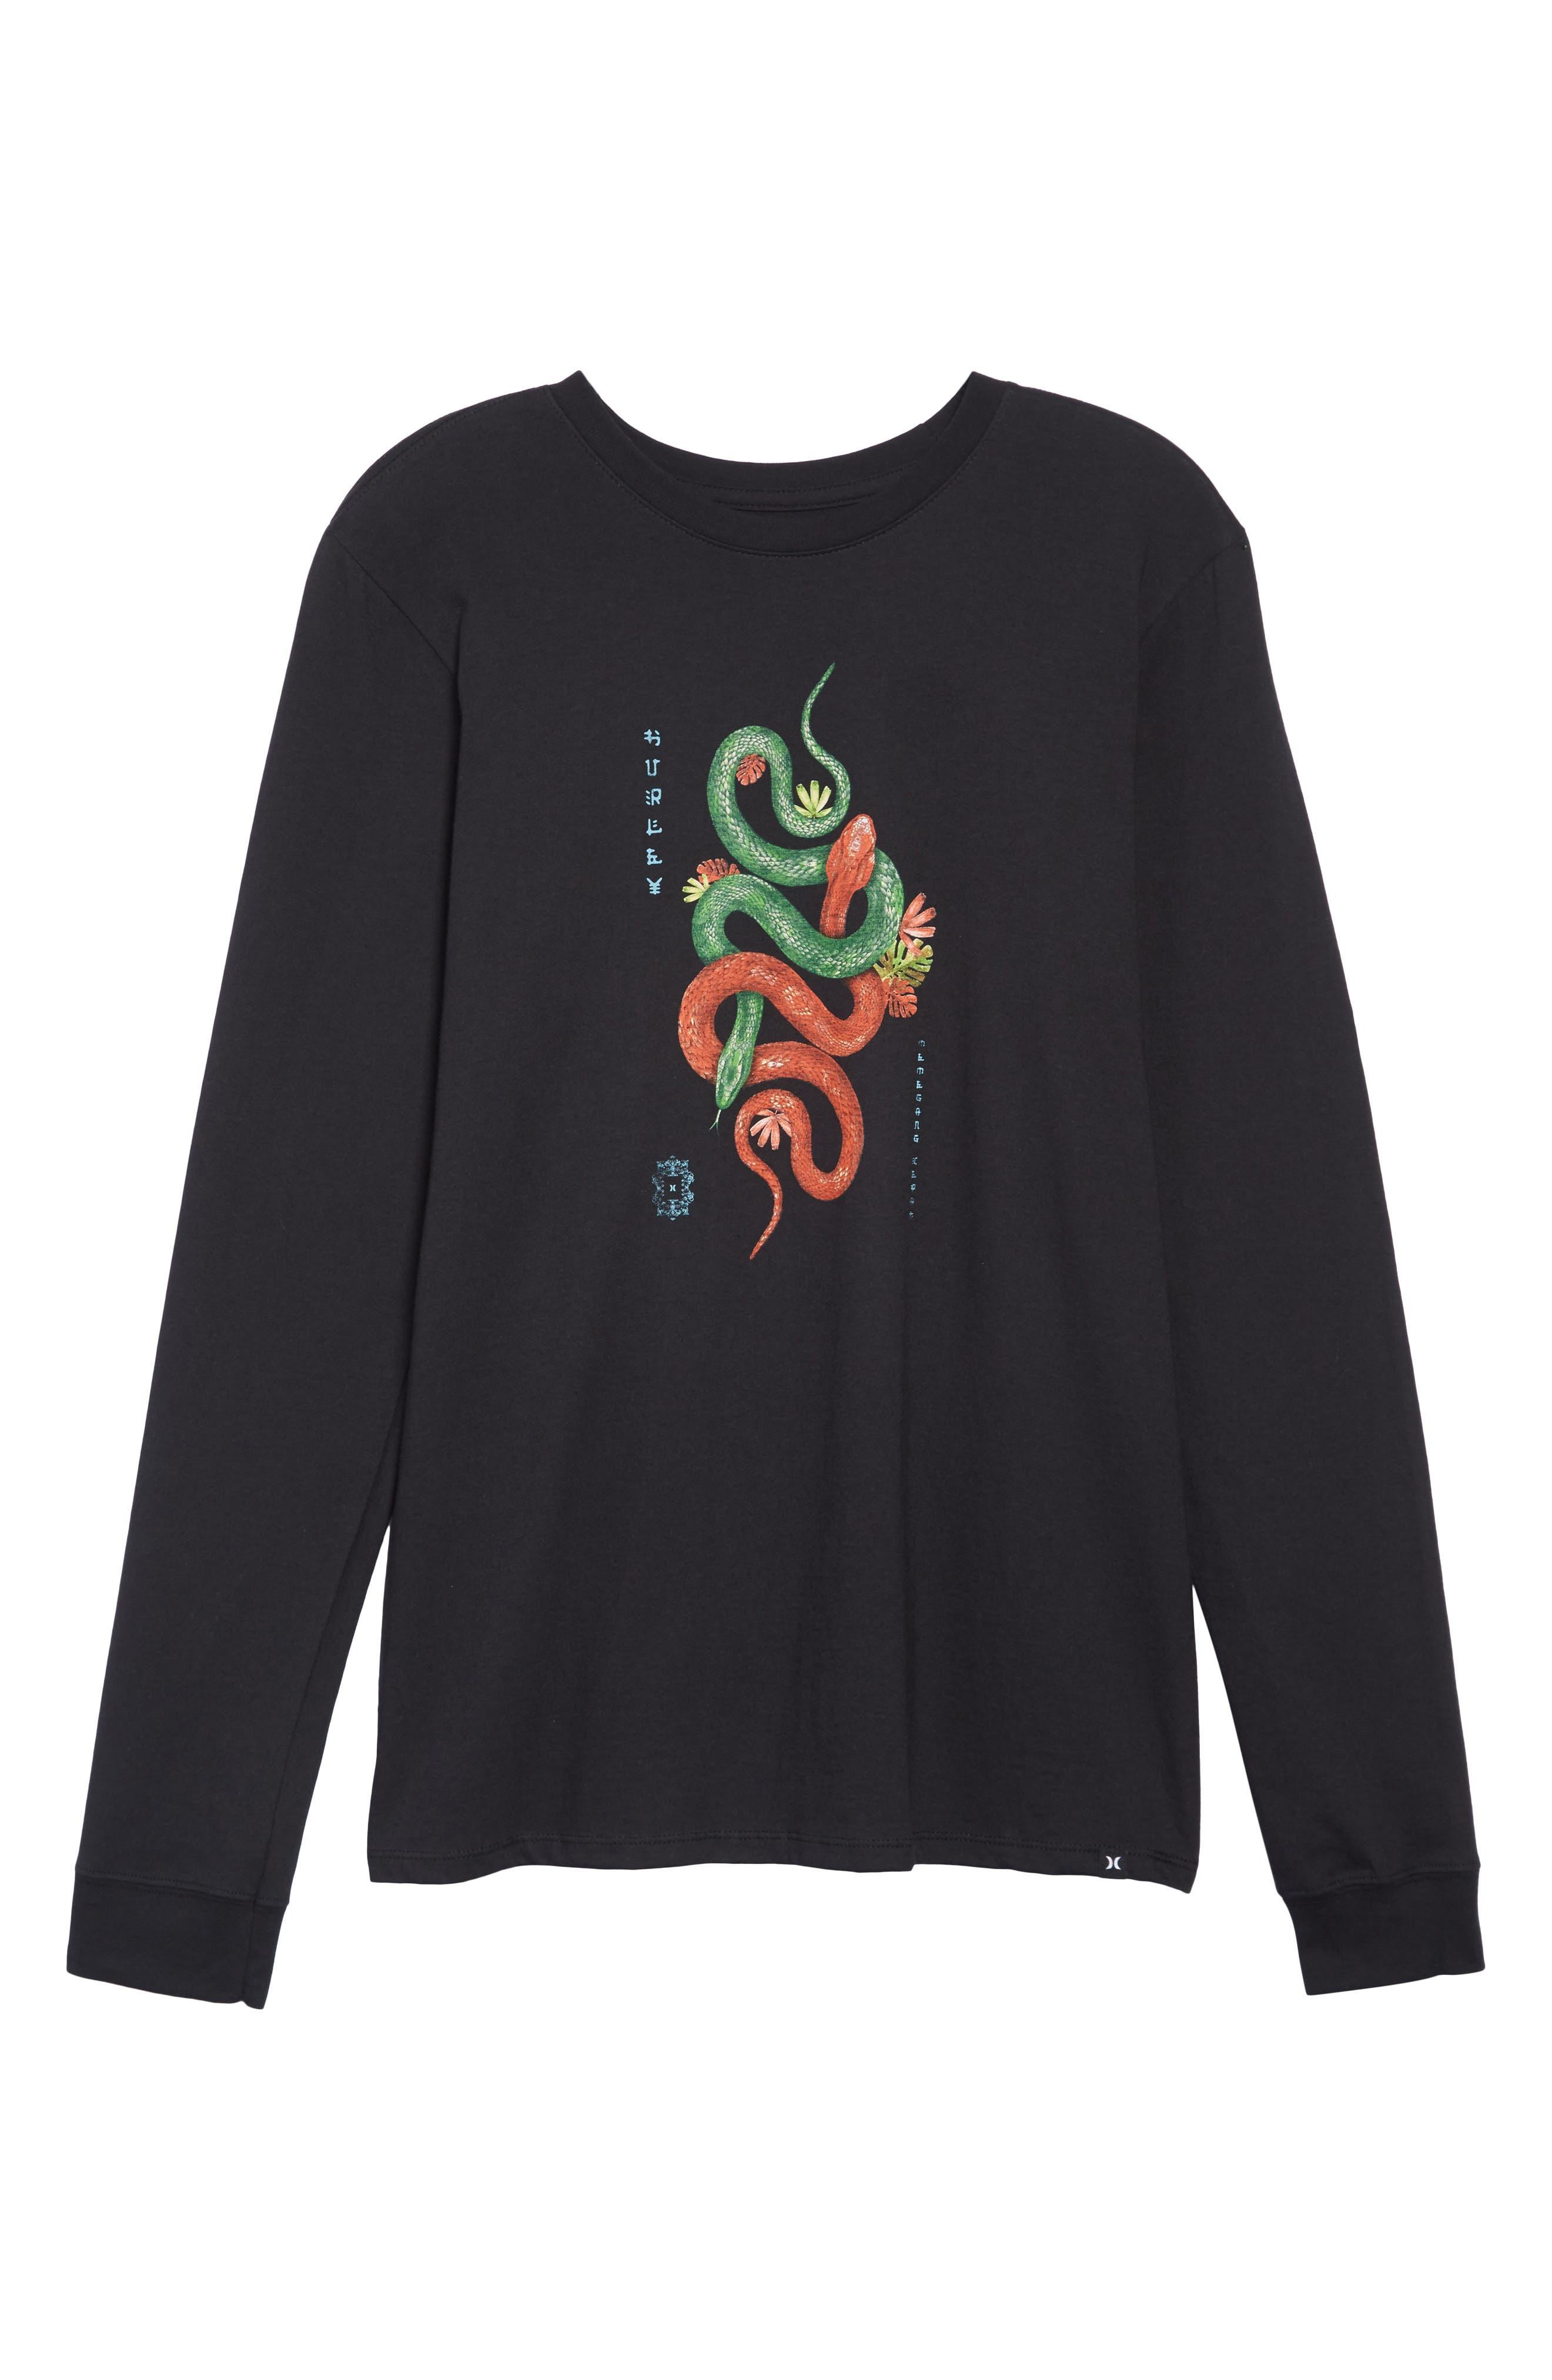 Tread Lightly Long Sleeve T-Shirt,                             Alternate thumbnail 6, color,                             BLACK